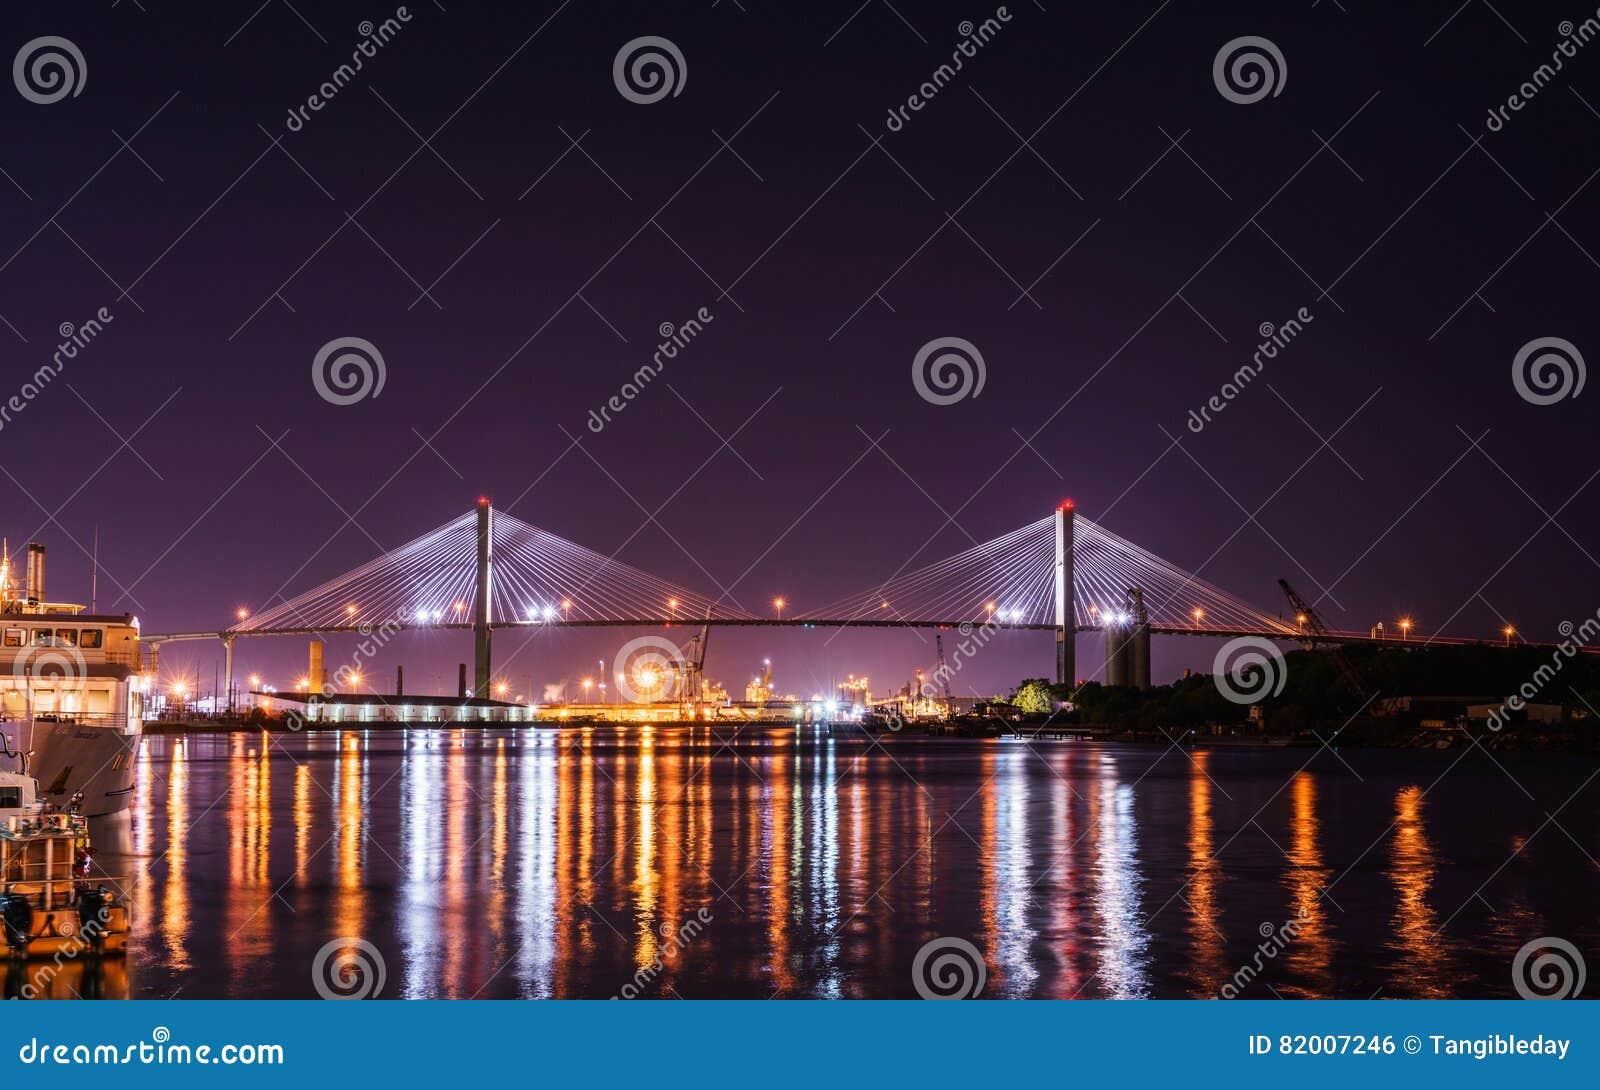 Savannah Night Bridge